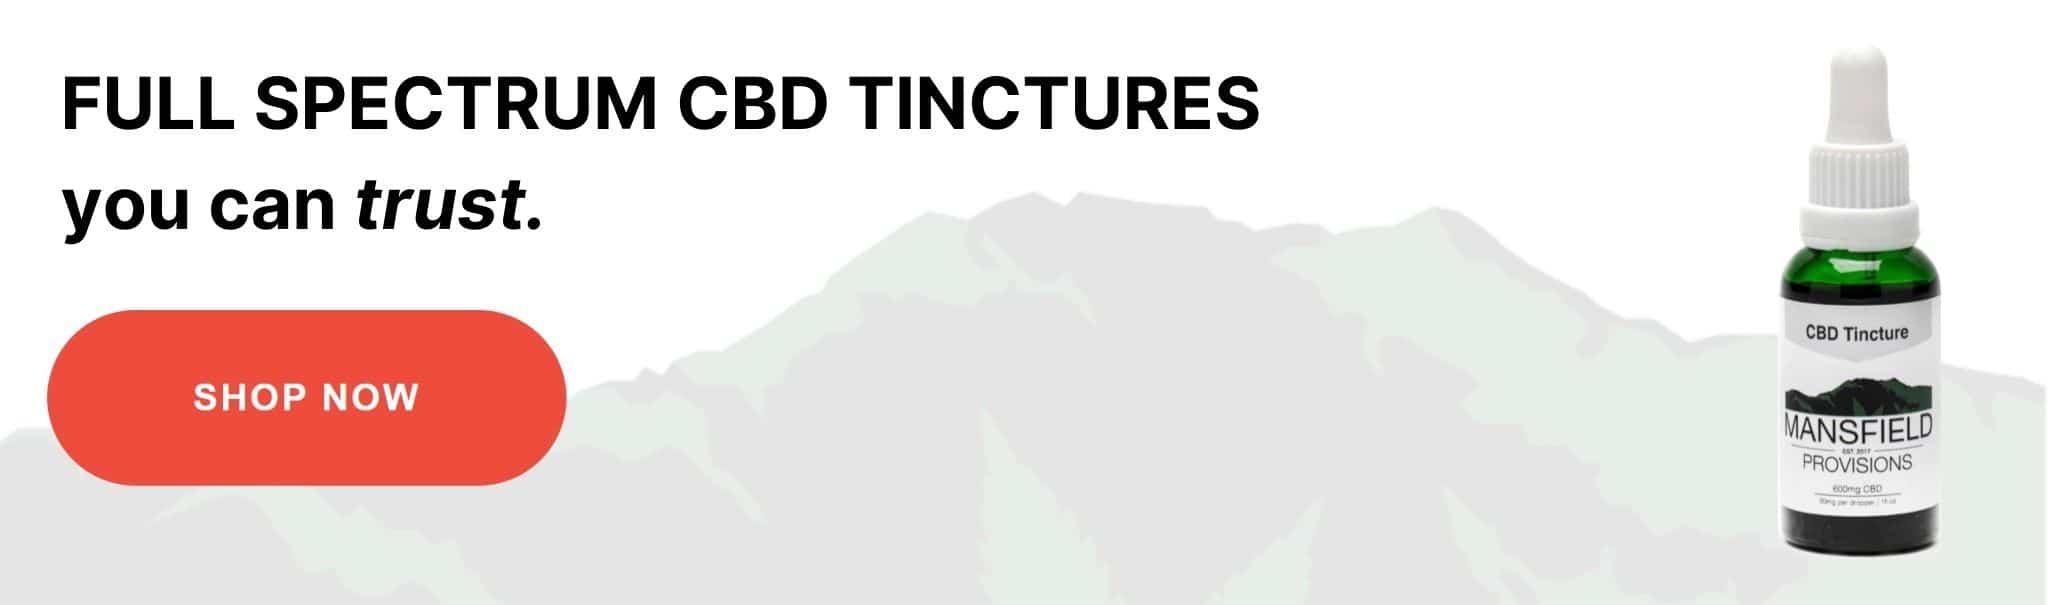 Shop Full spectrum CBD tinctures you can trust